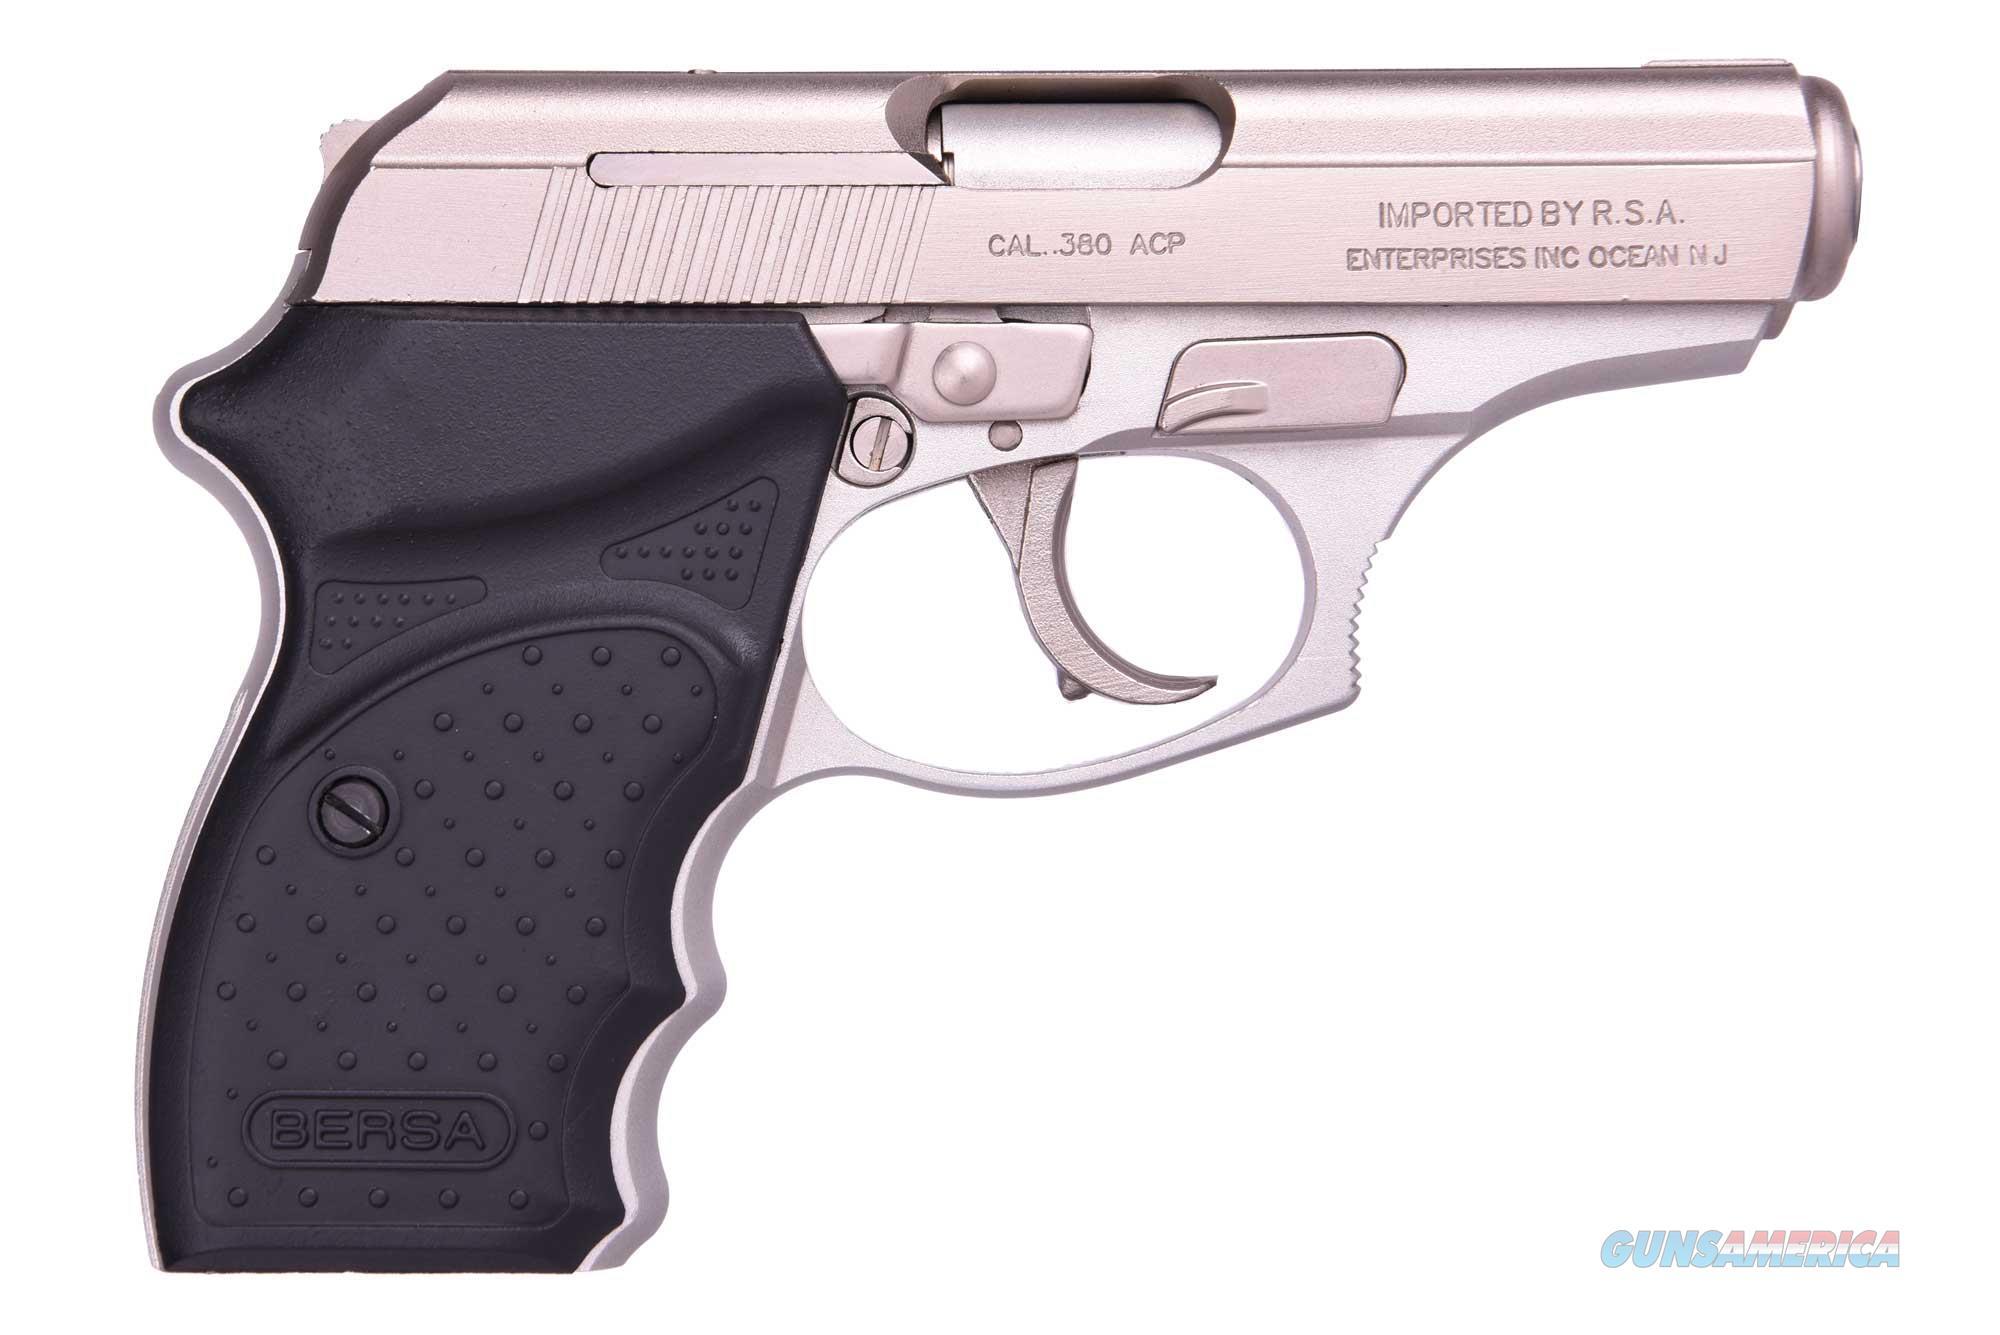 Thunder 380 Nickel 380Acp Cc THUN380NKLCC  Guns > Pistols > Bersa Pistols